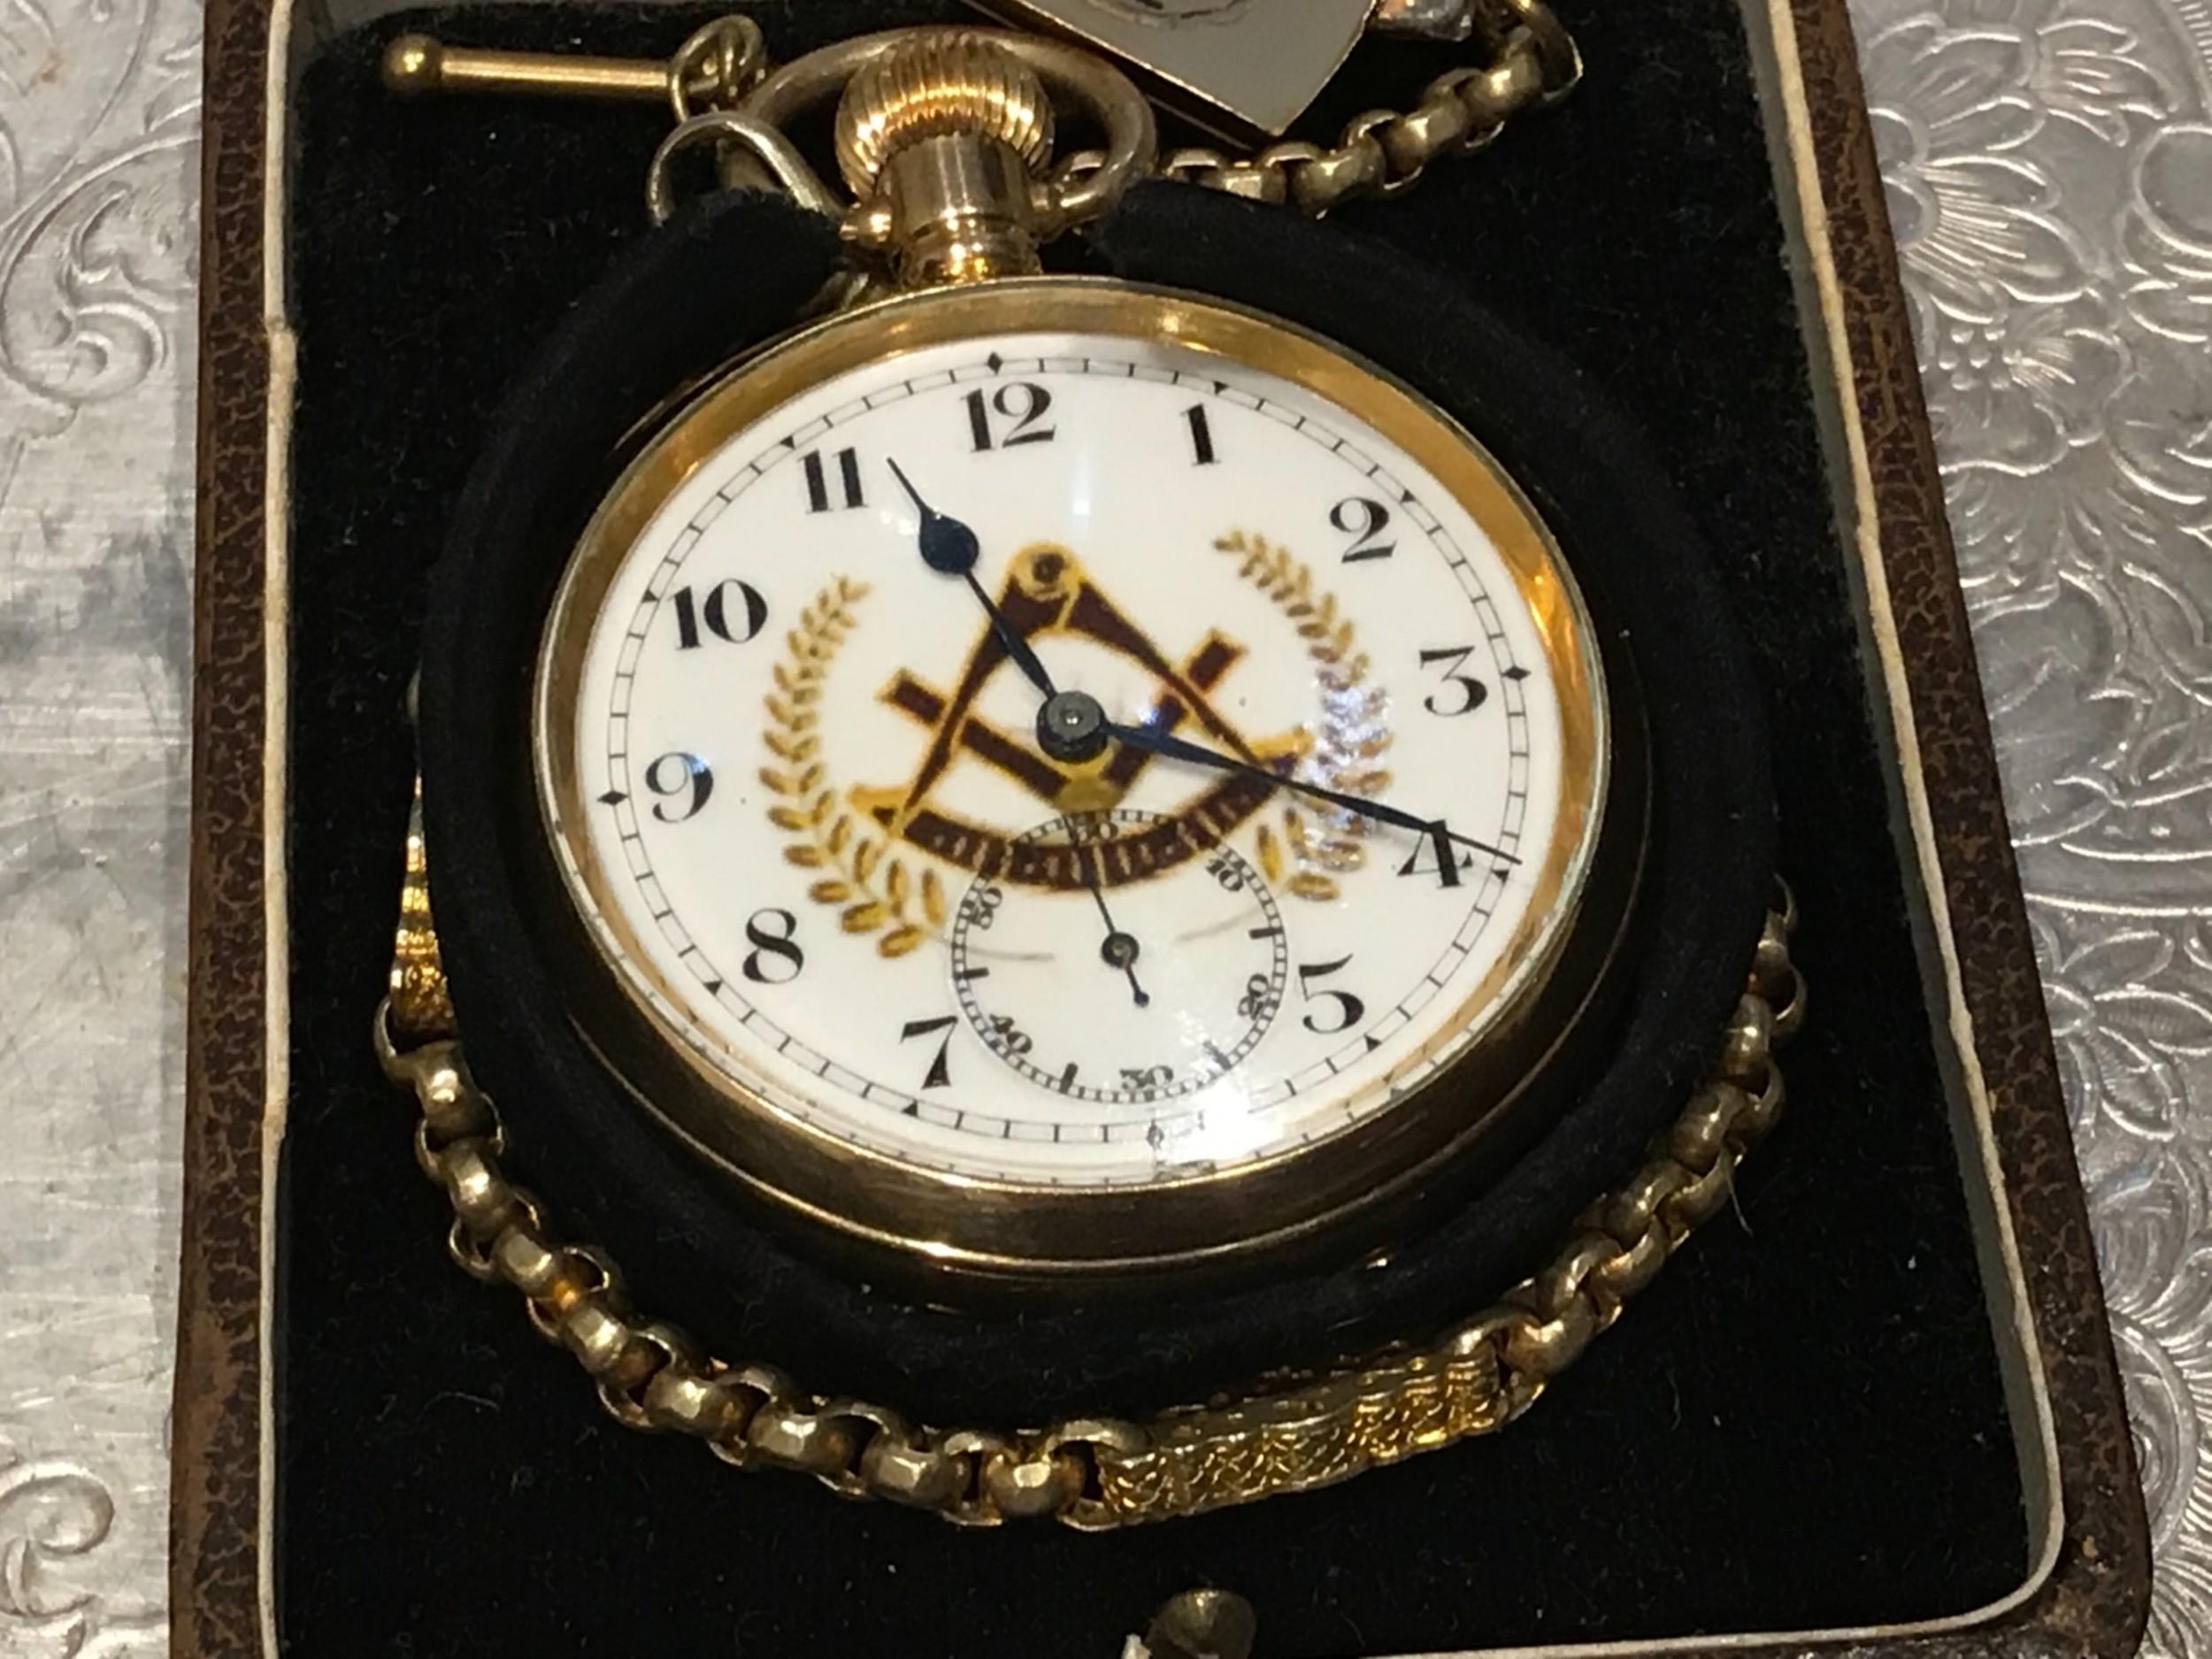 masonic pocket watch and chain fob